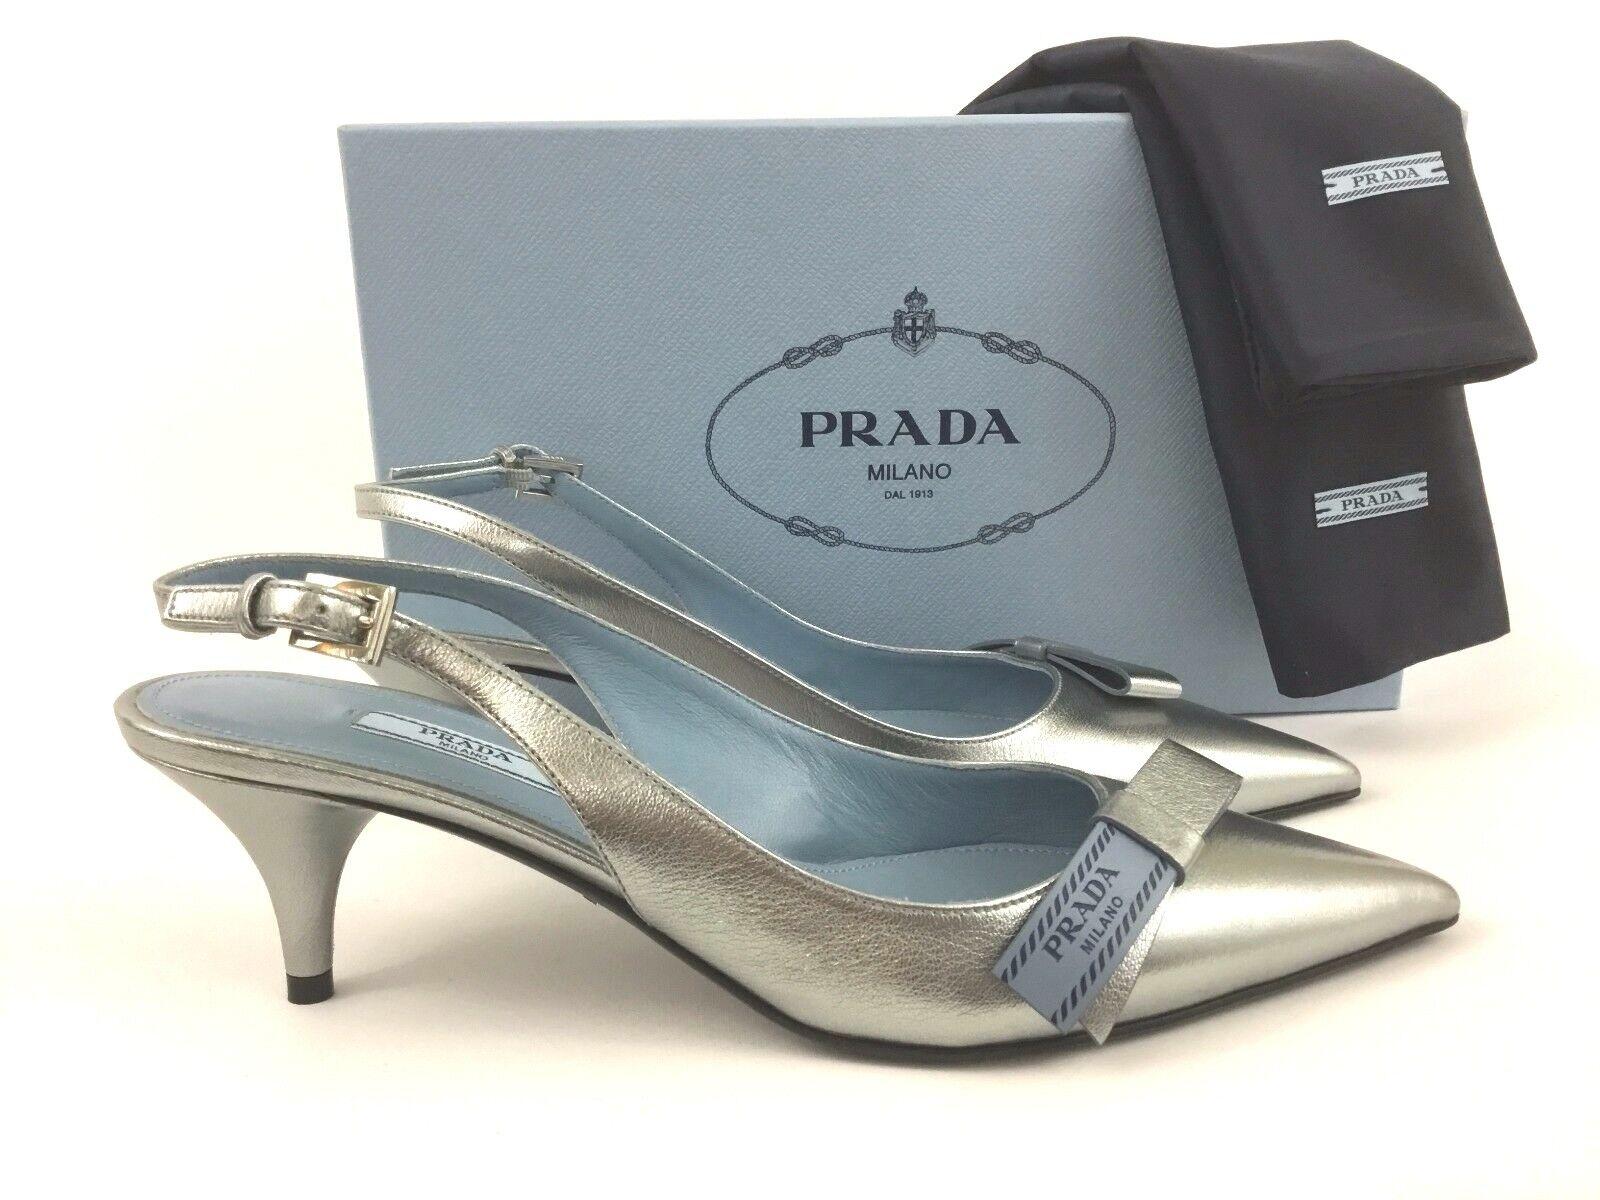 PRADA Logo Bow Silver Leather Slingback Pump 38 8